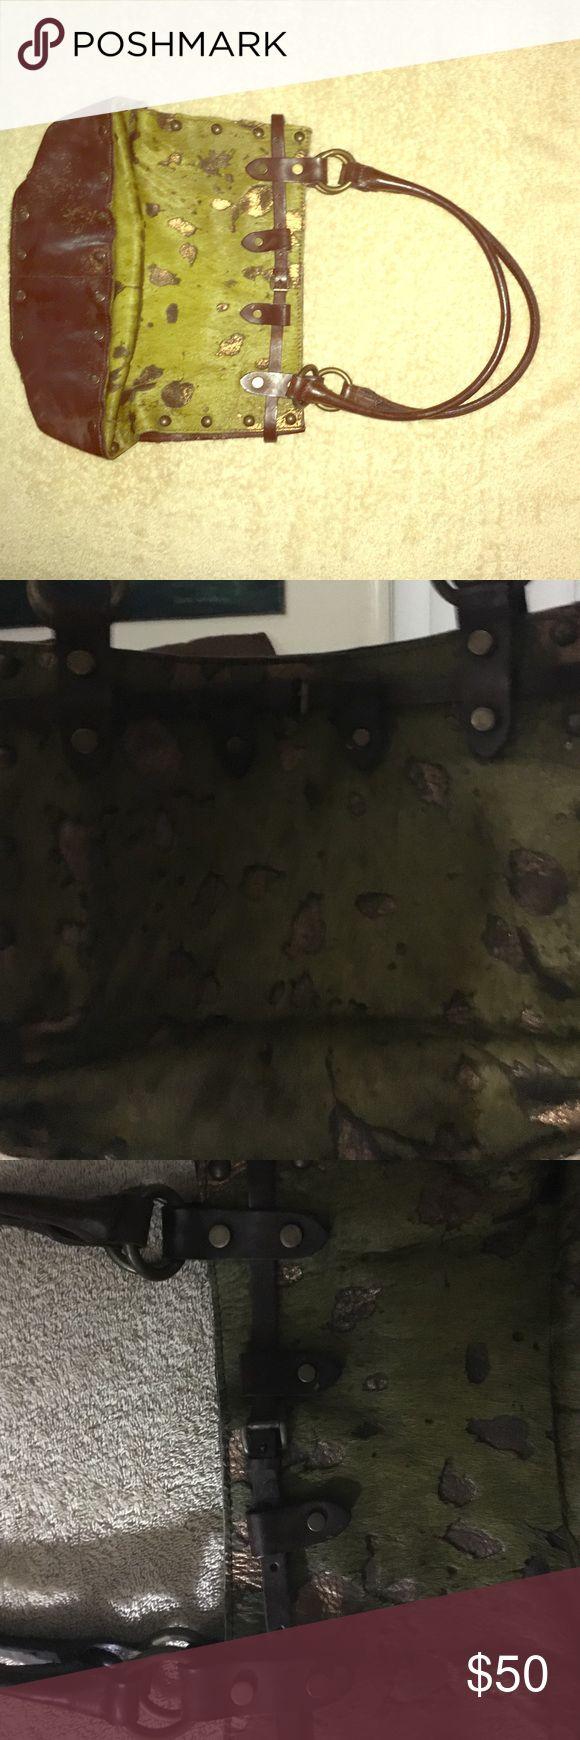 Green & gold fur bag w/ leather & brass hard wear Cow hide Green & Gold leather purse with brass colored hard wear - studded. All dark leather trim. Italian made -Maurizio Taiuti. maurizio taiuti  Bags Shoulder Bags